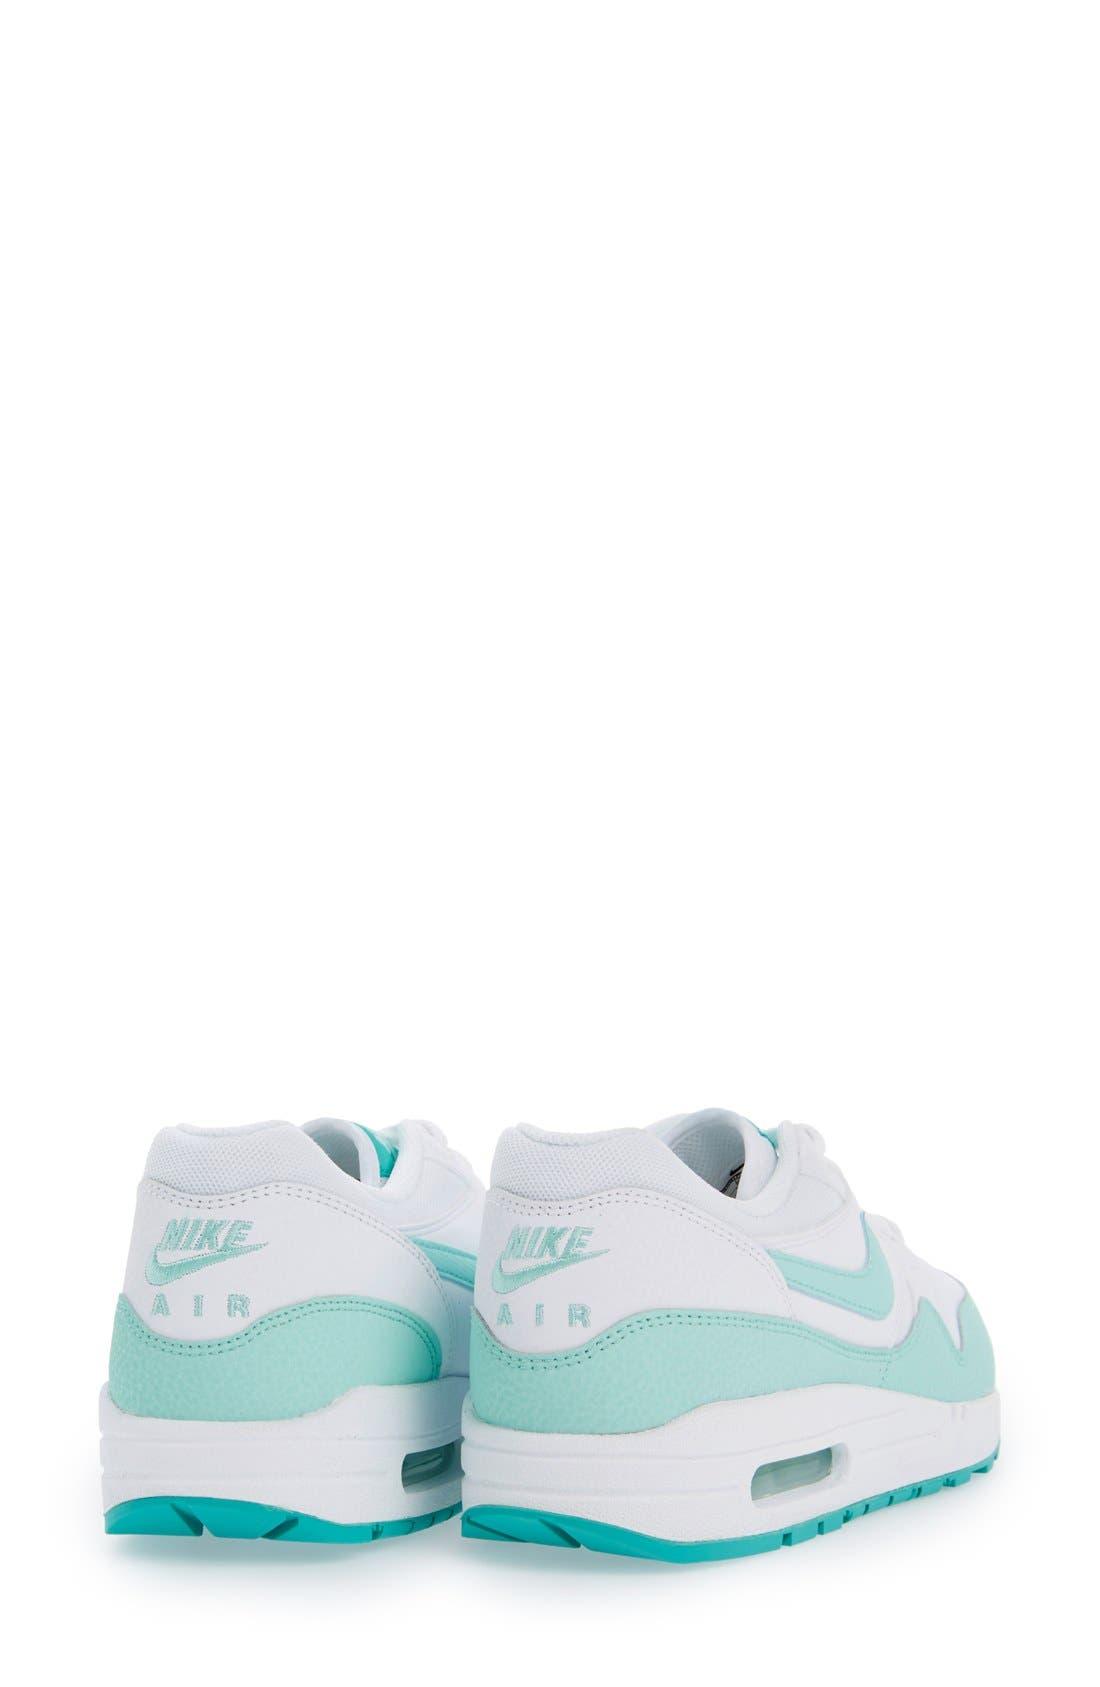 Alternate Image 3  - Nike 'Air Max 1 Essential' Sneaker (Women)